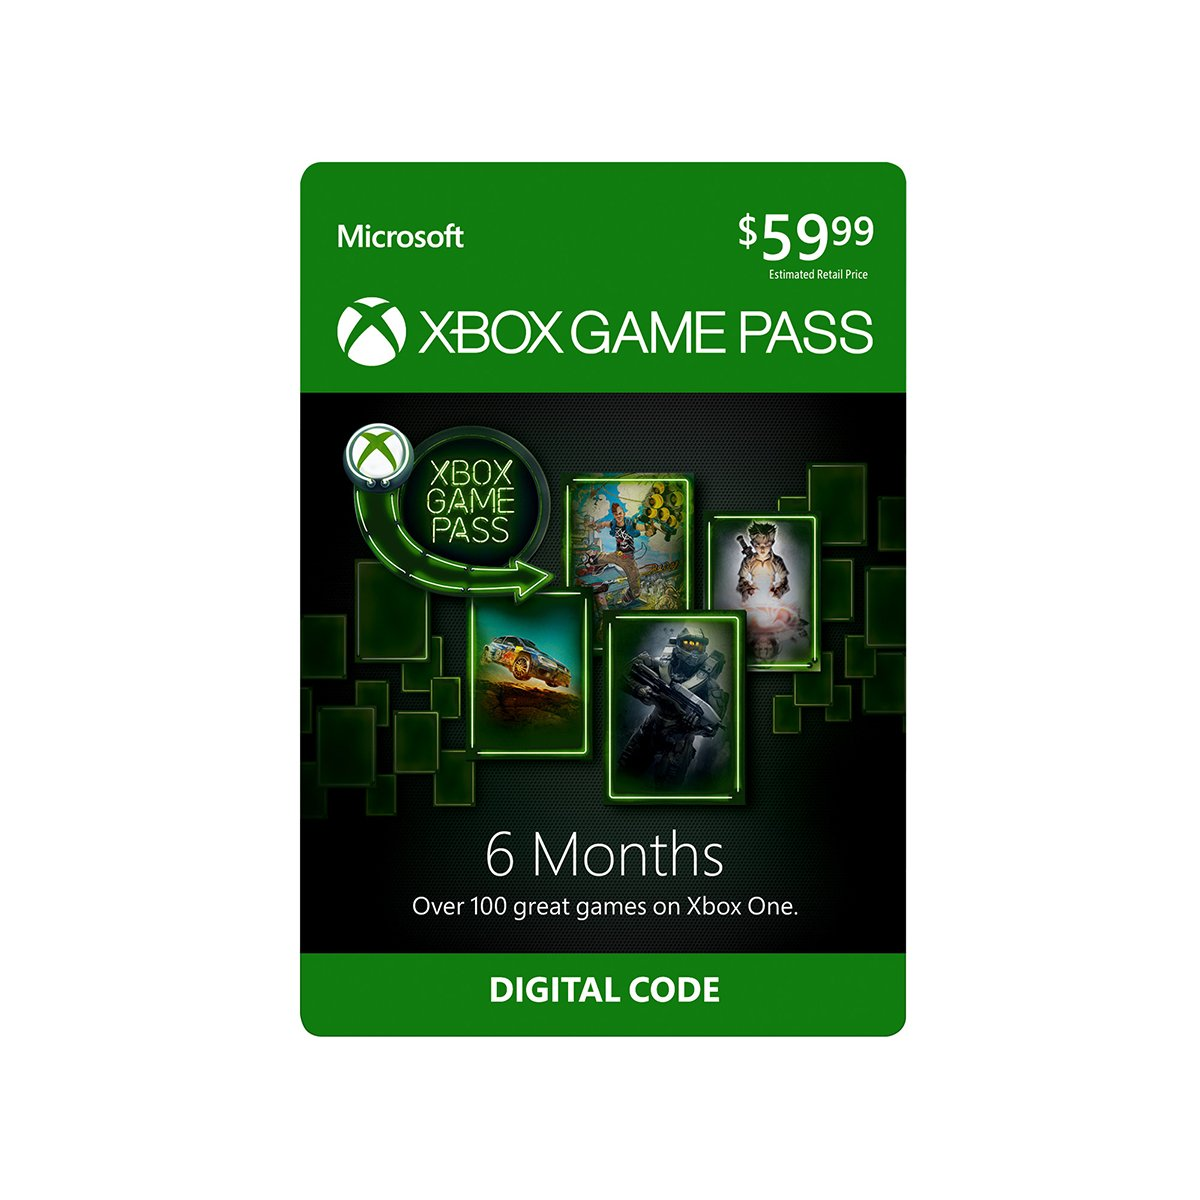 Xbox Game Pass: 6 Month Membership [Digital Code] by Microsoft